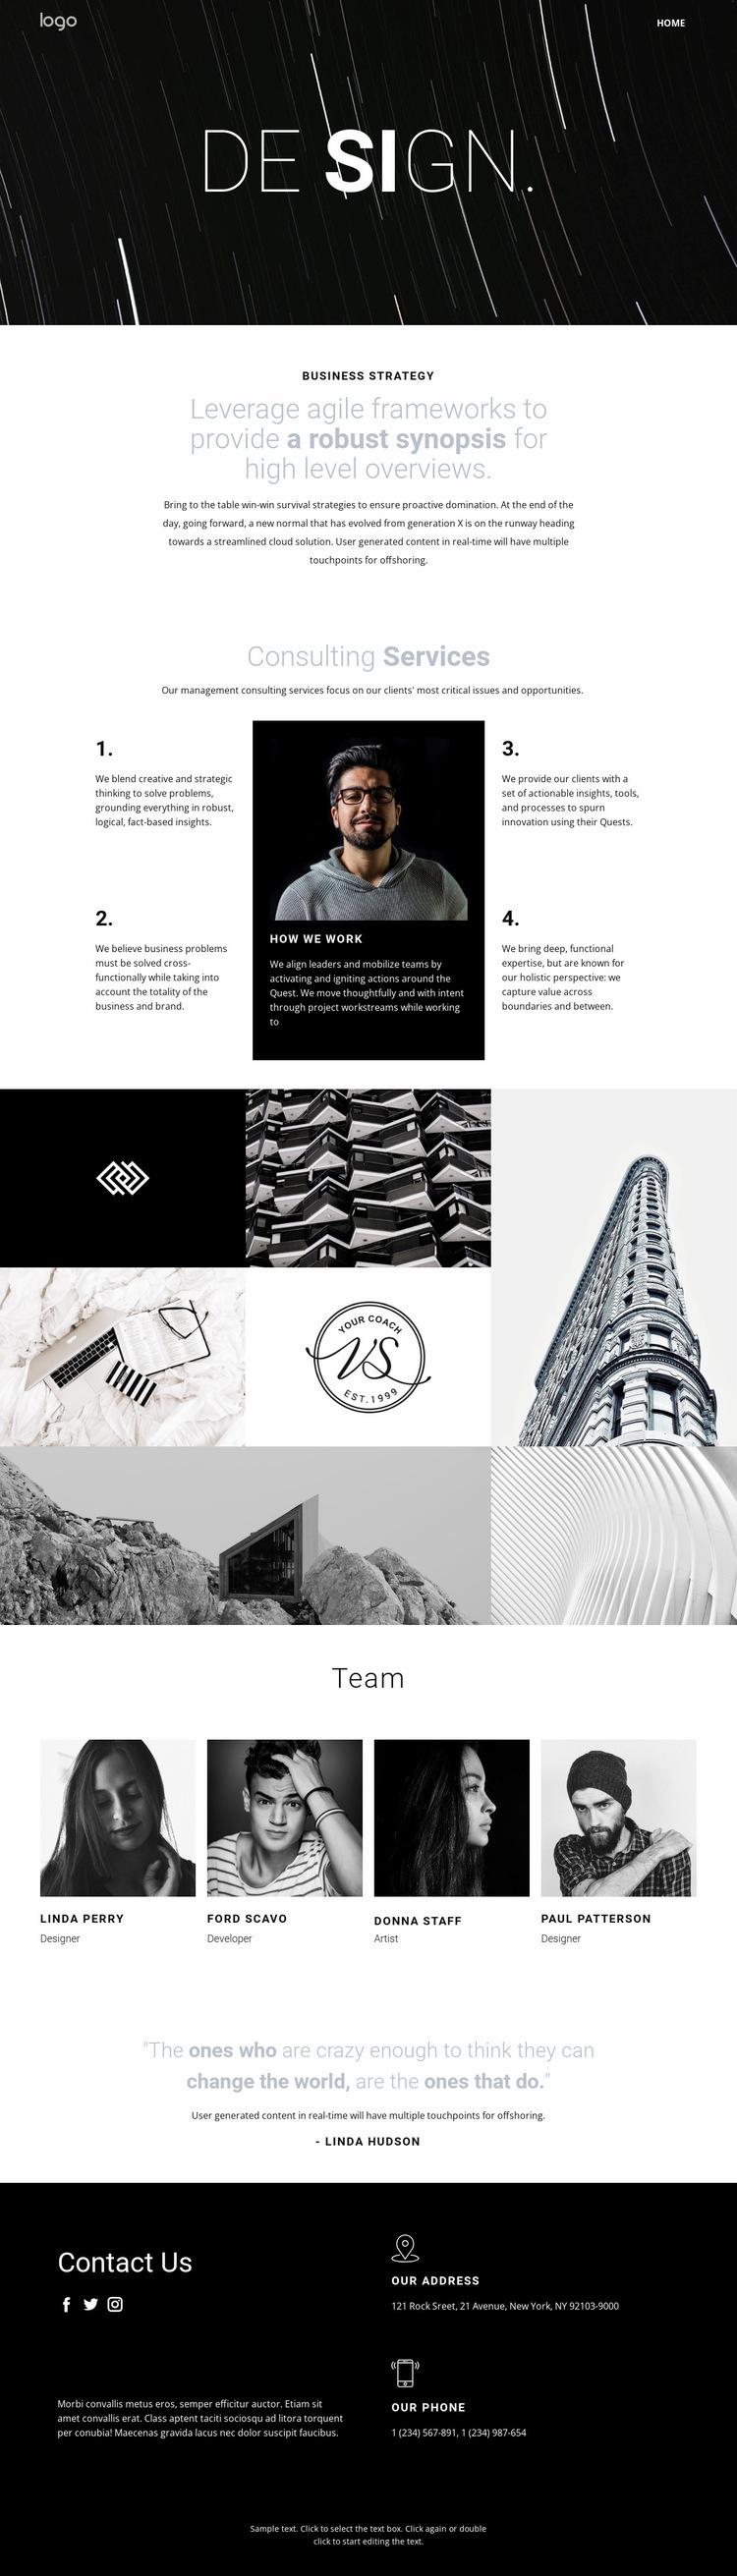 Design and creative art  Website Builder